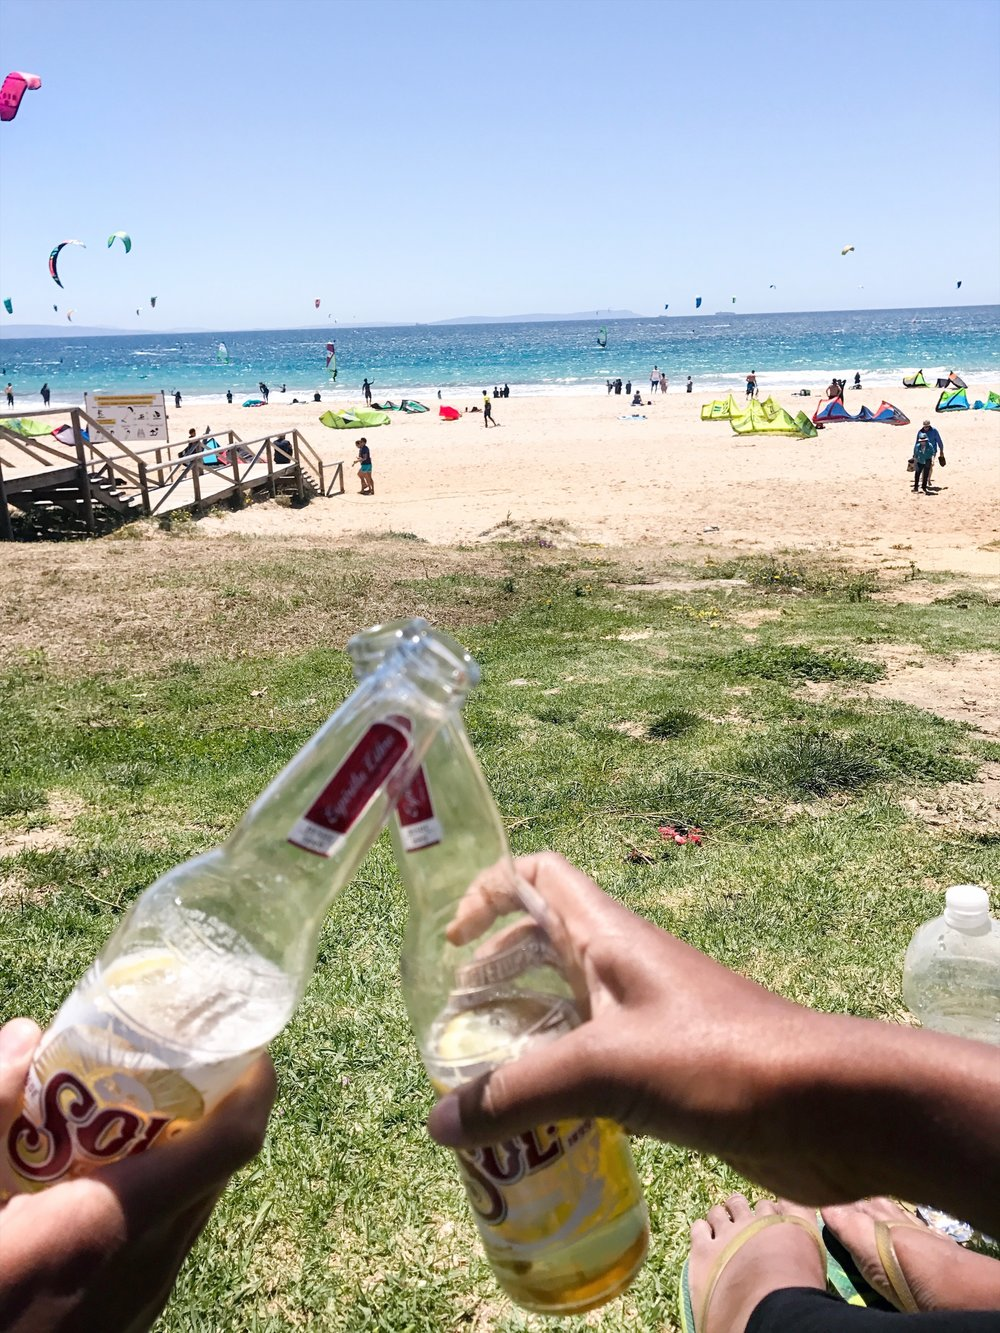 Playa de los Lances, Tarifa, Spain